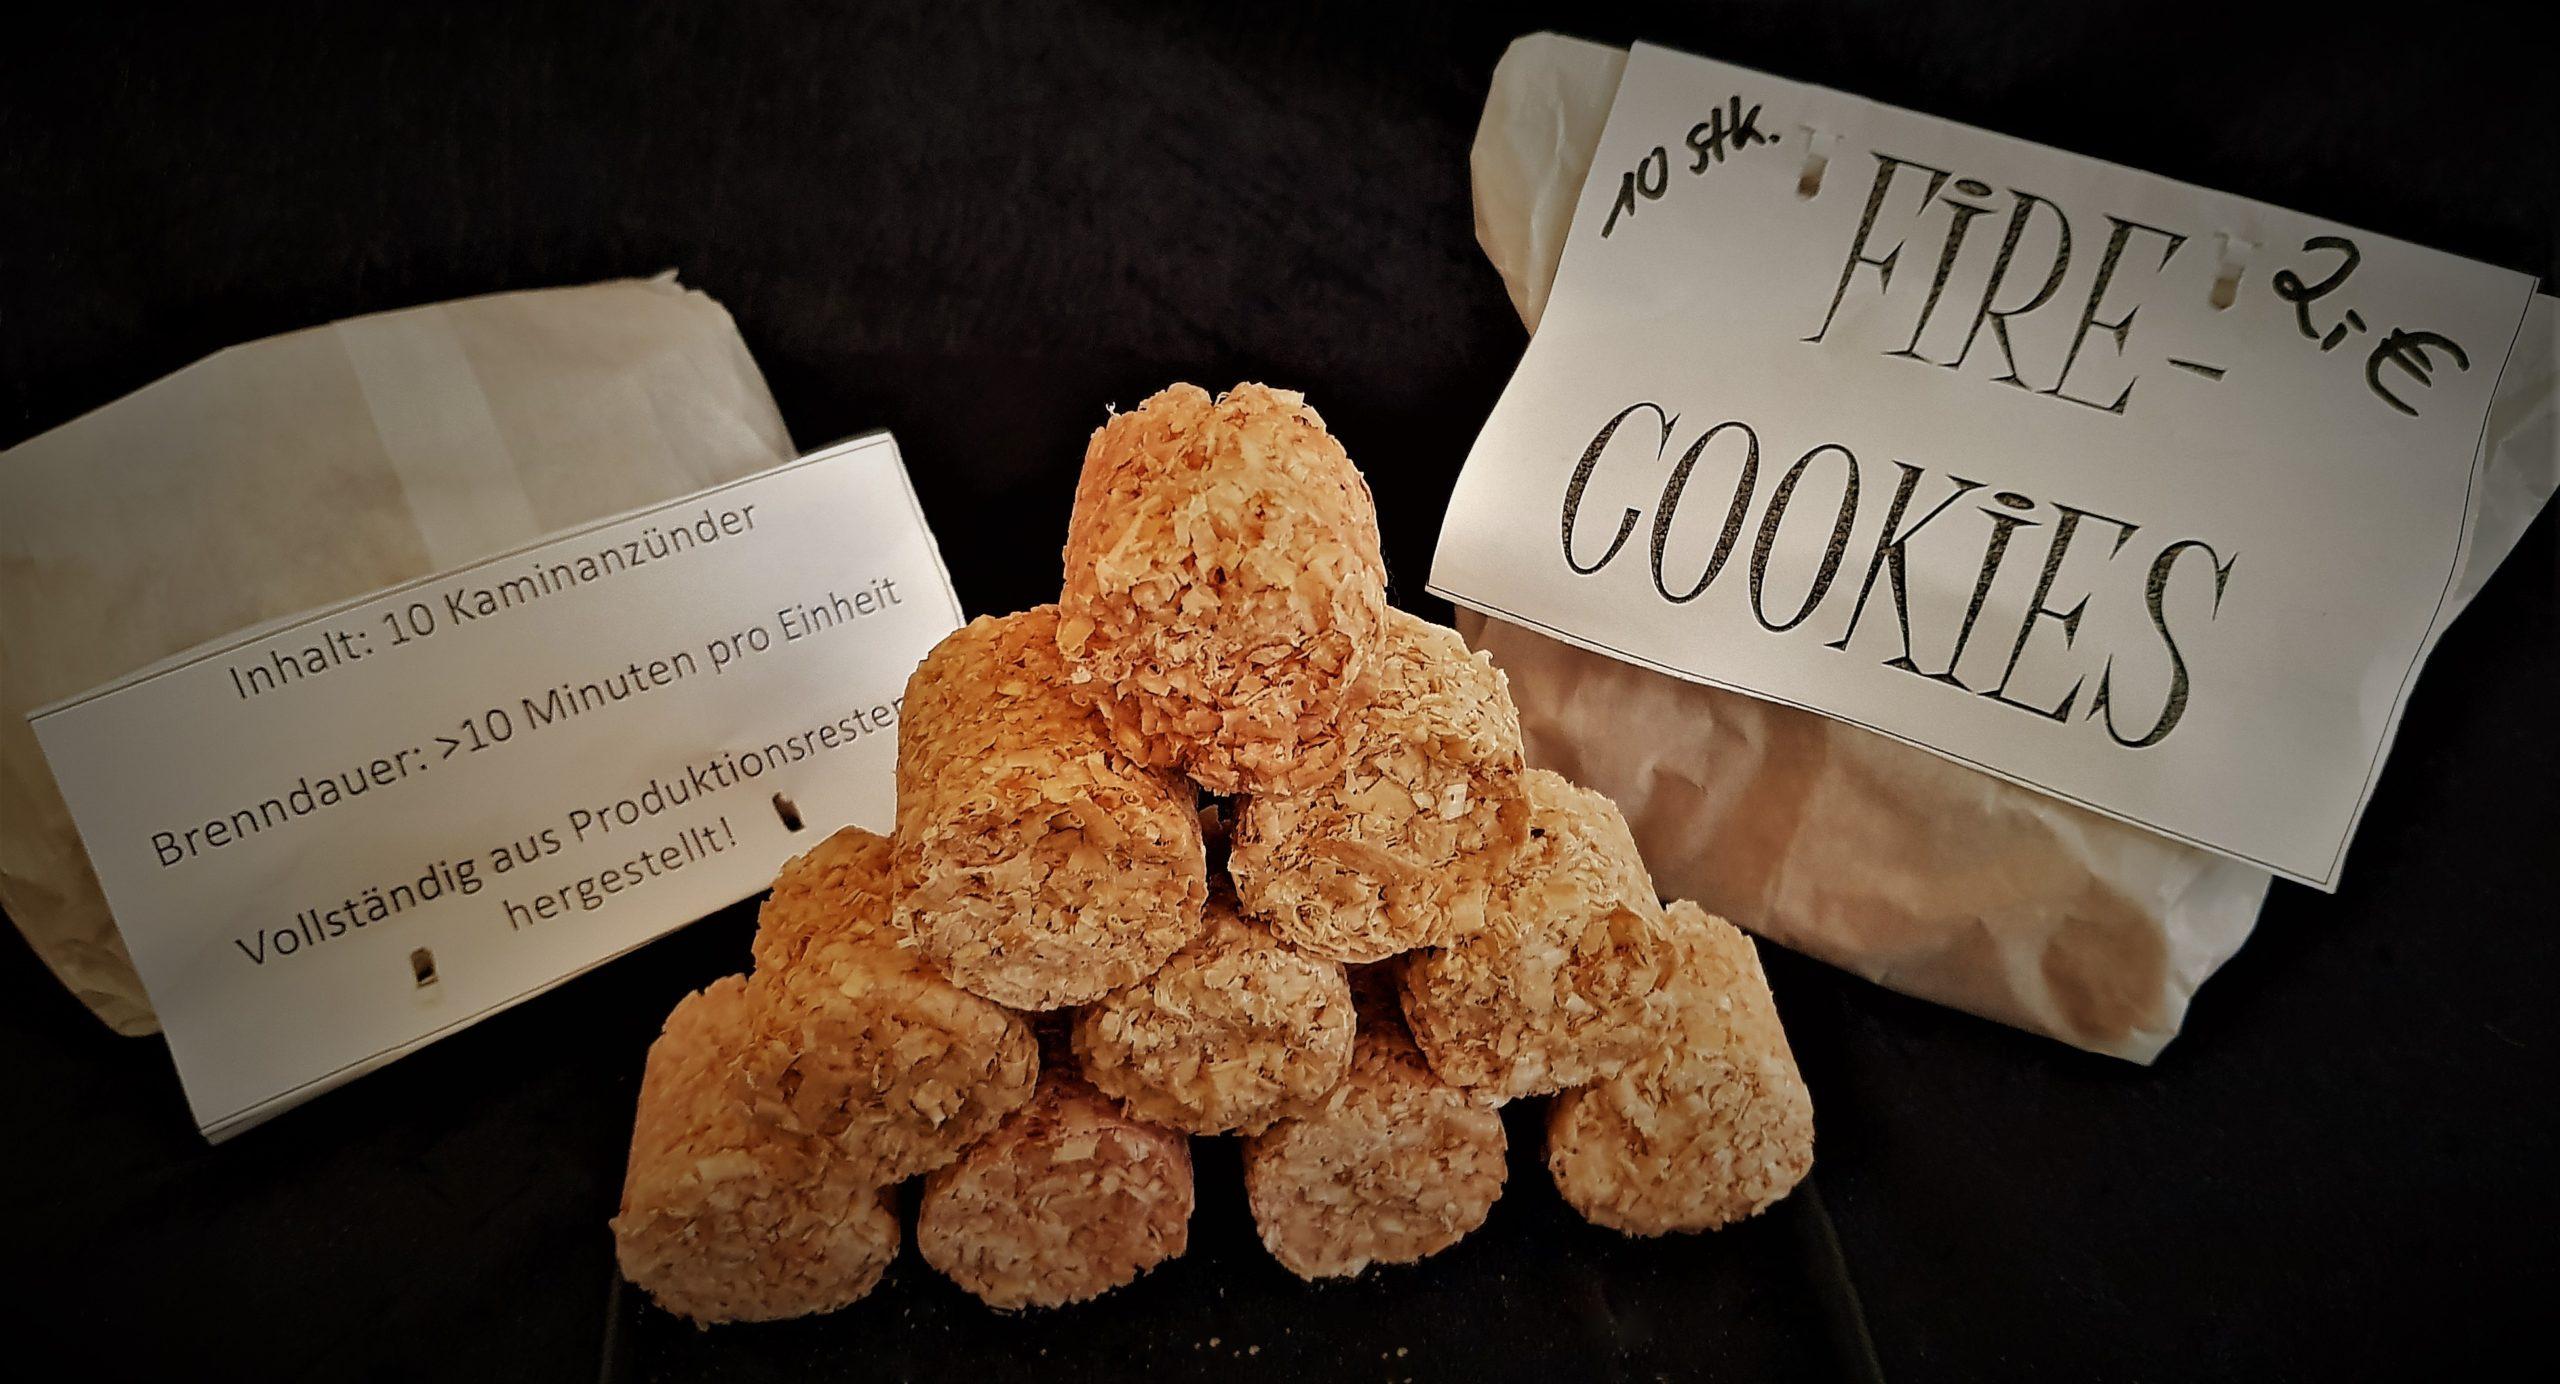 Firecookies